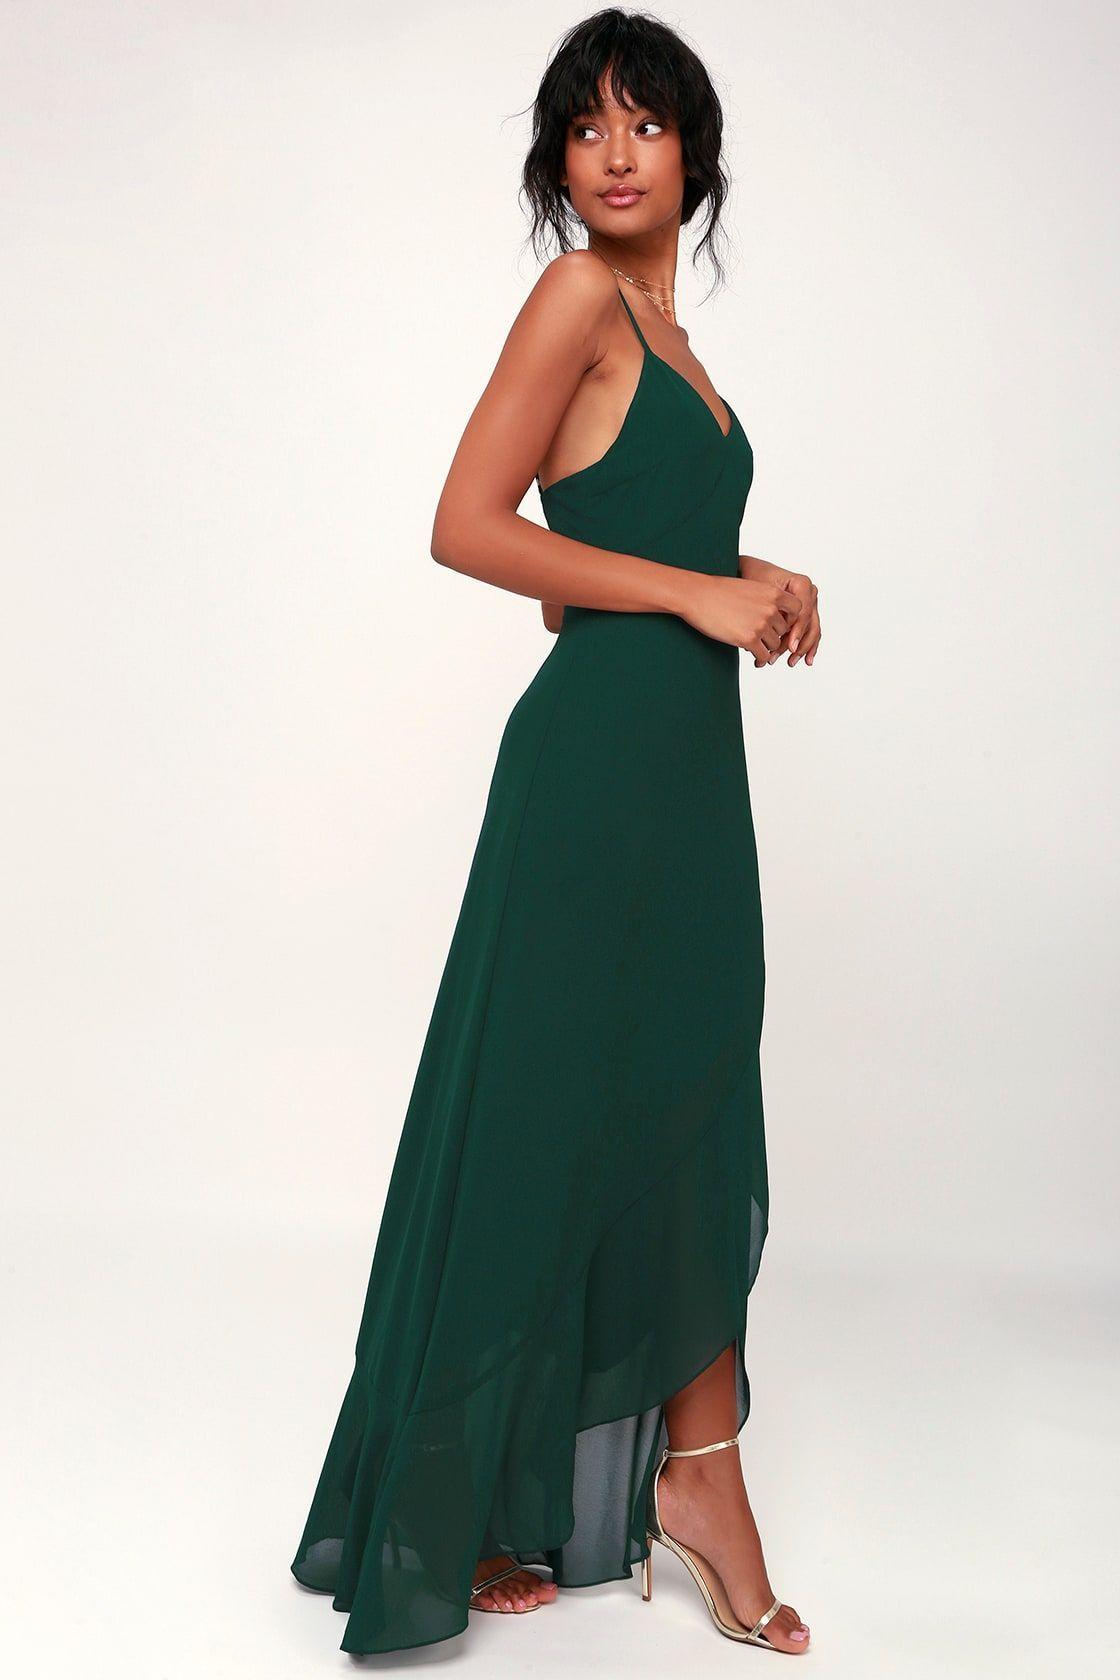 Ada forest green laceup maxi dress green chiffon dress